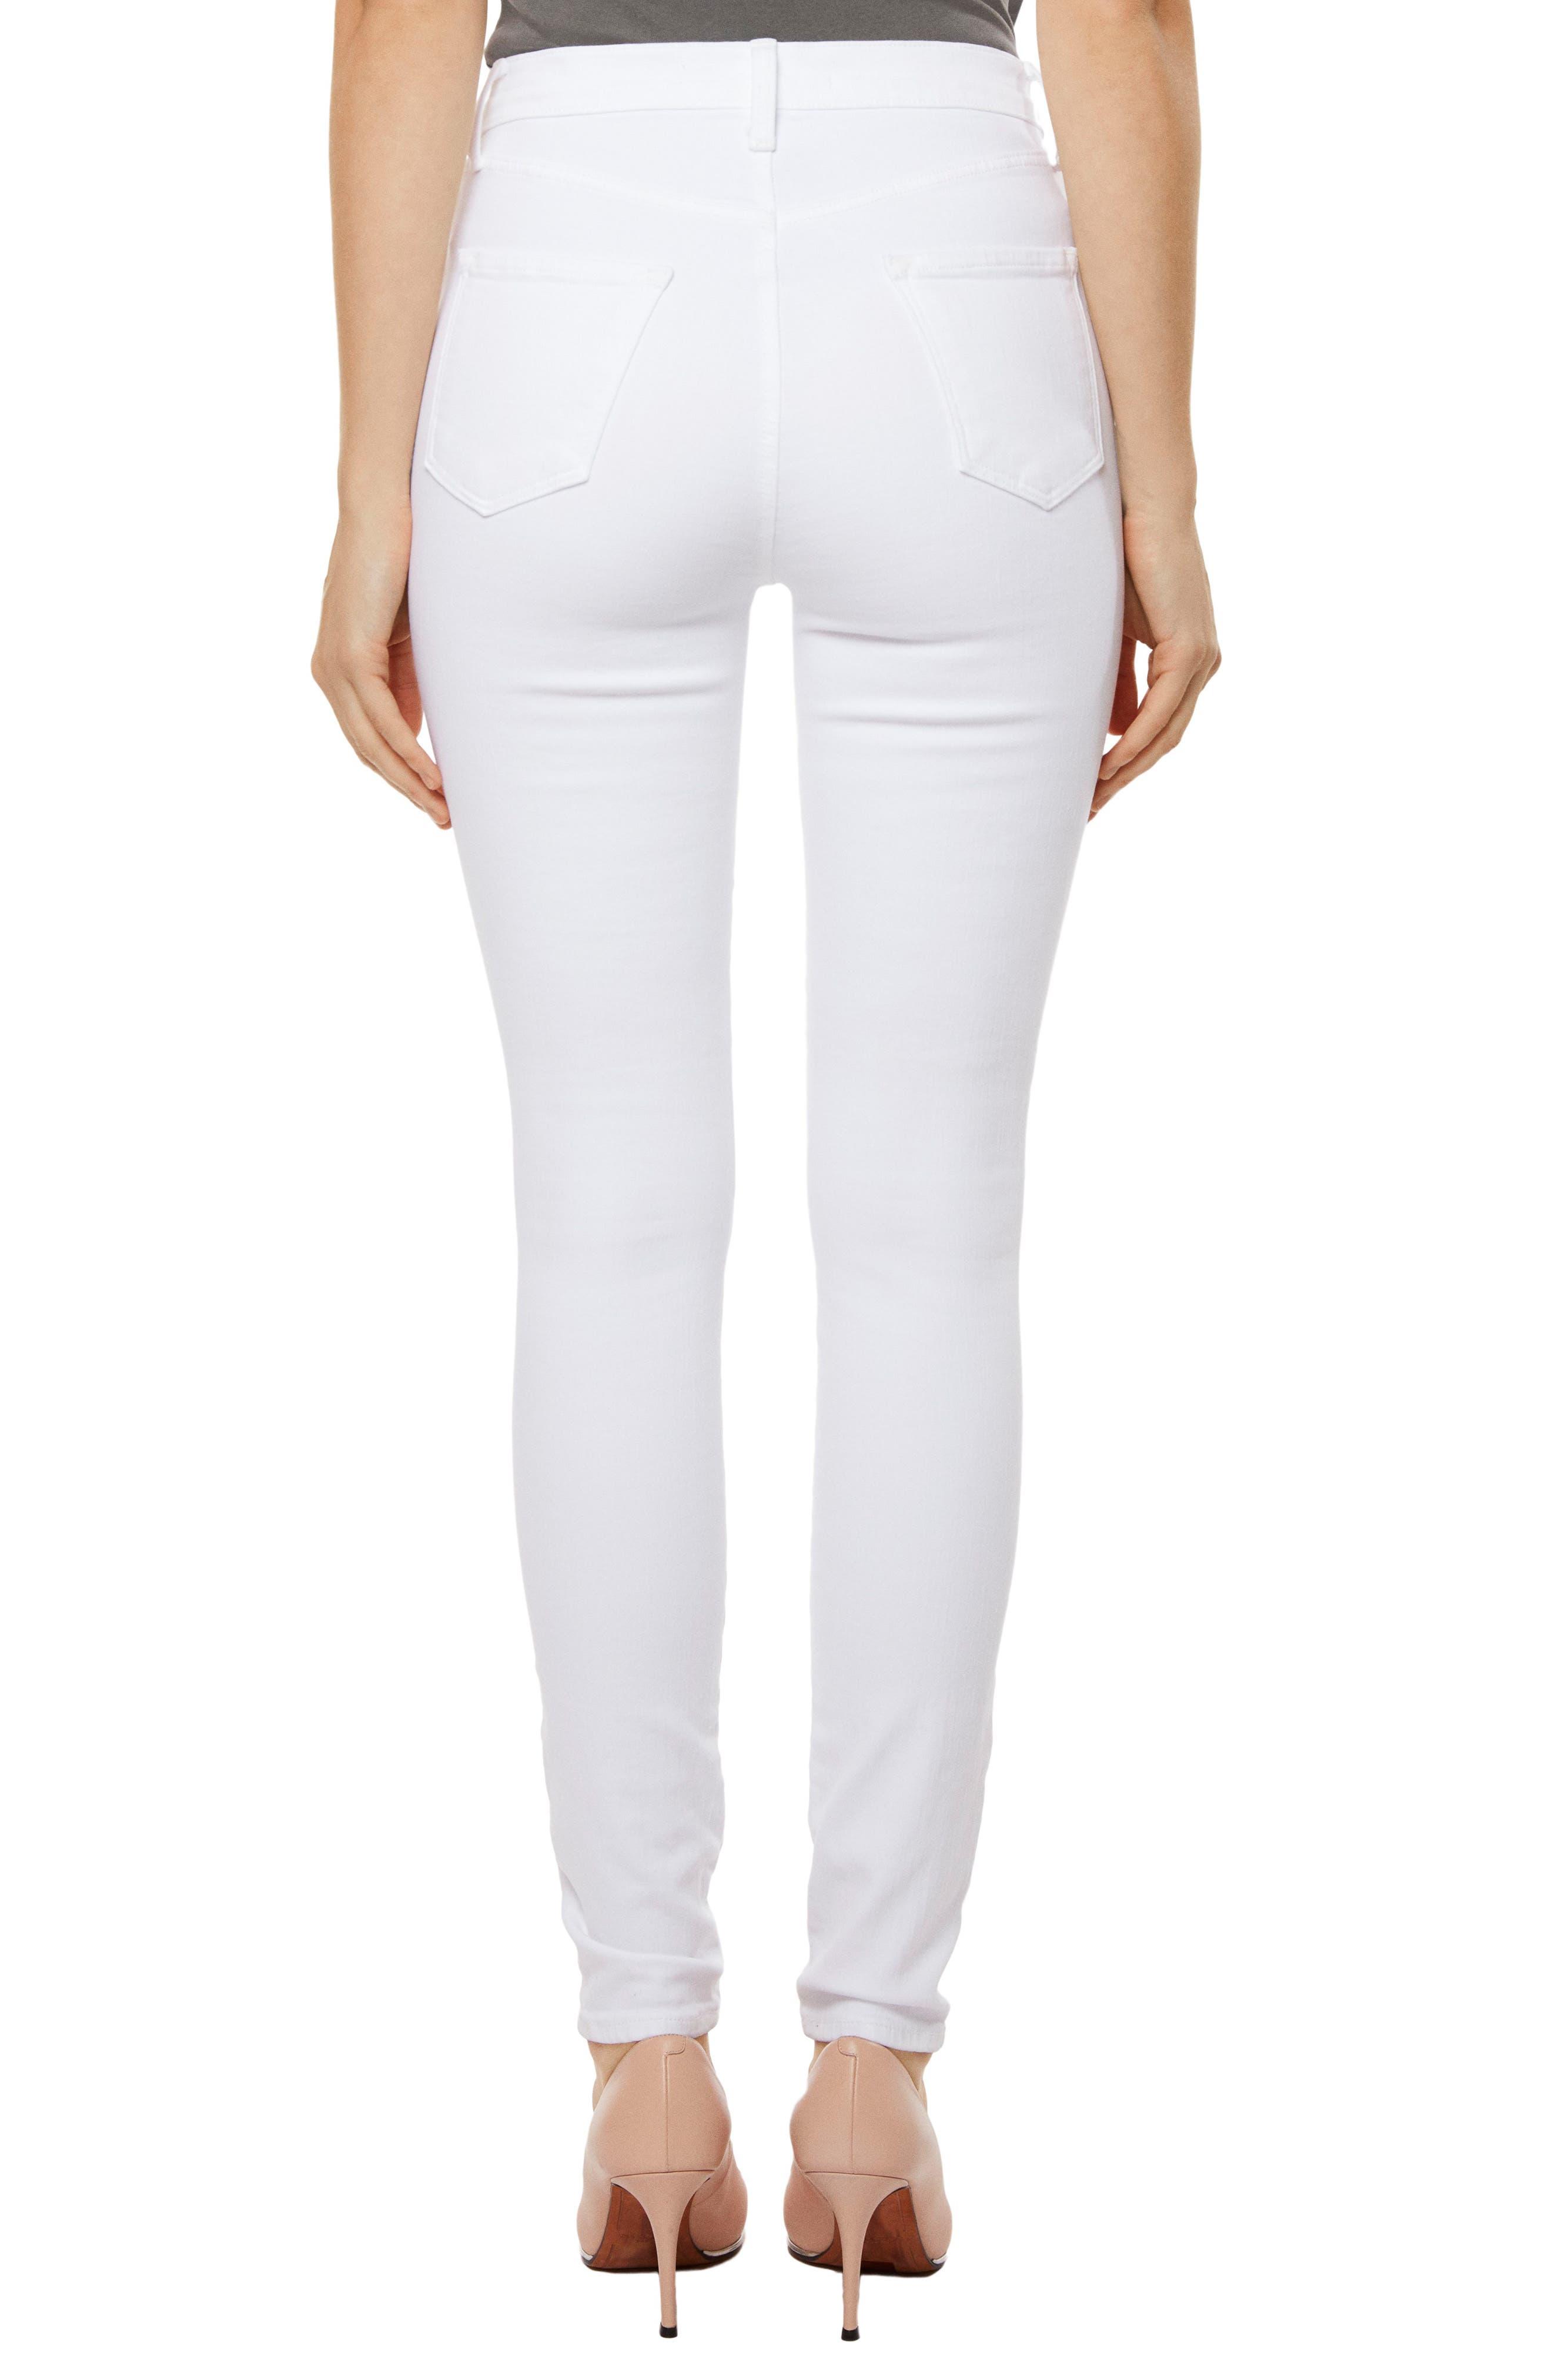 Alana High Waist Crop Skinny Jeans,                             Alternate thumbnail 2, color,                             160